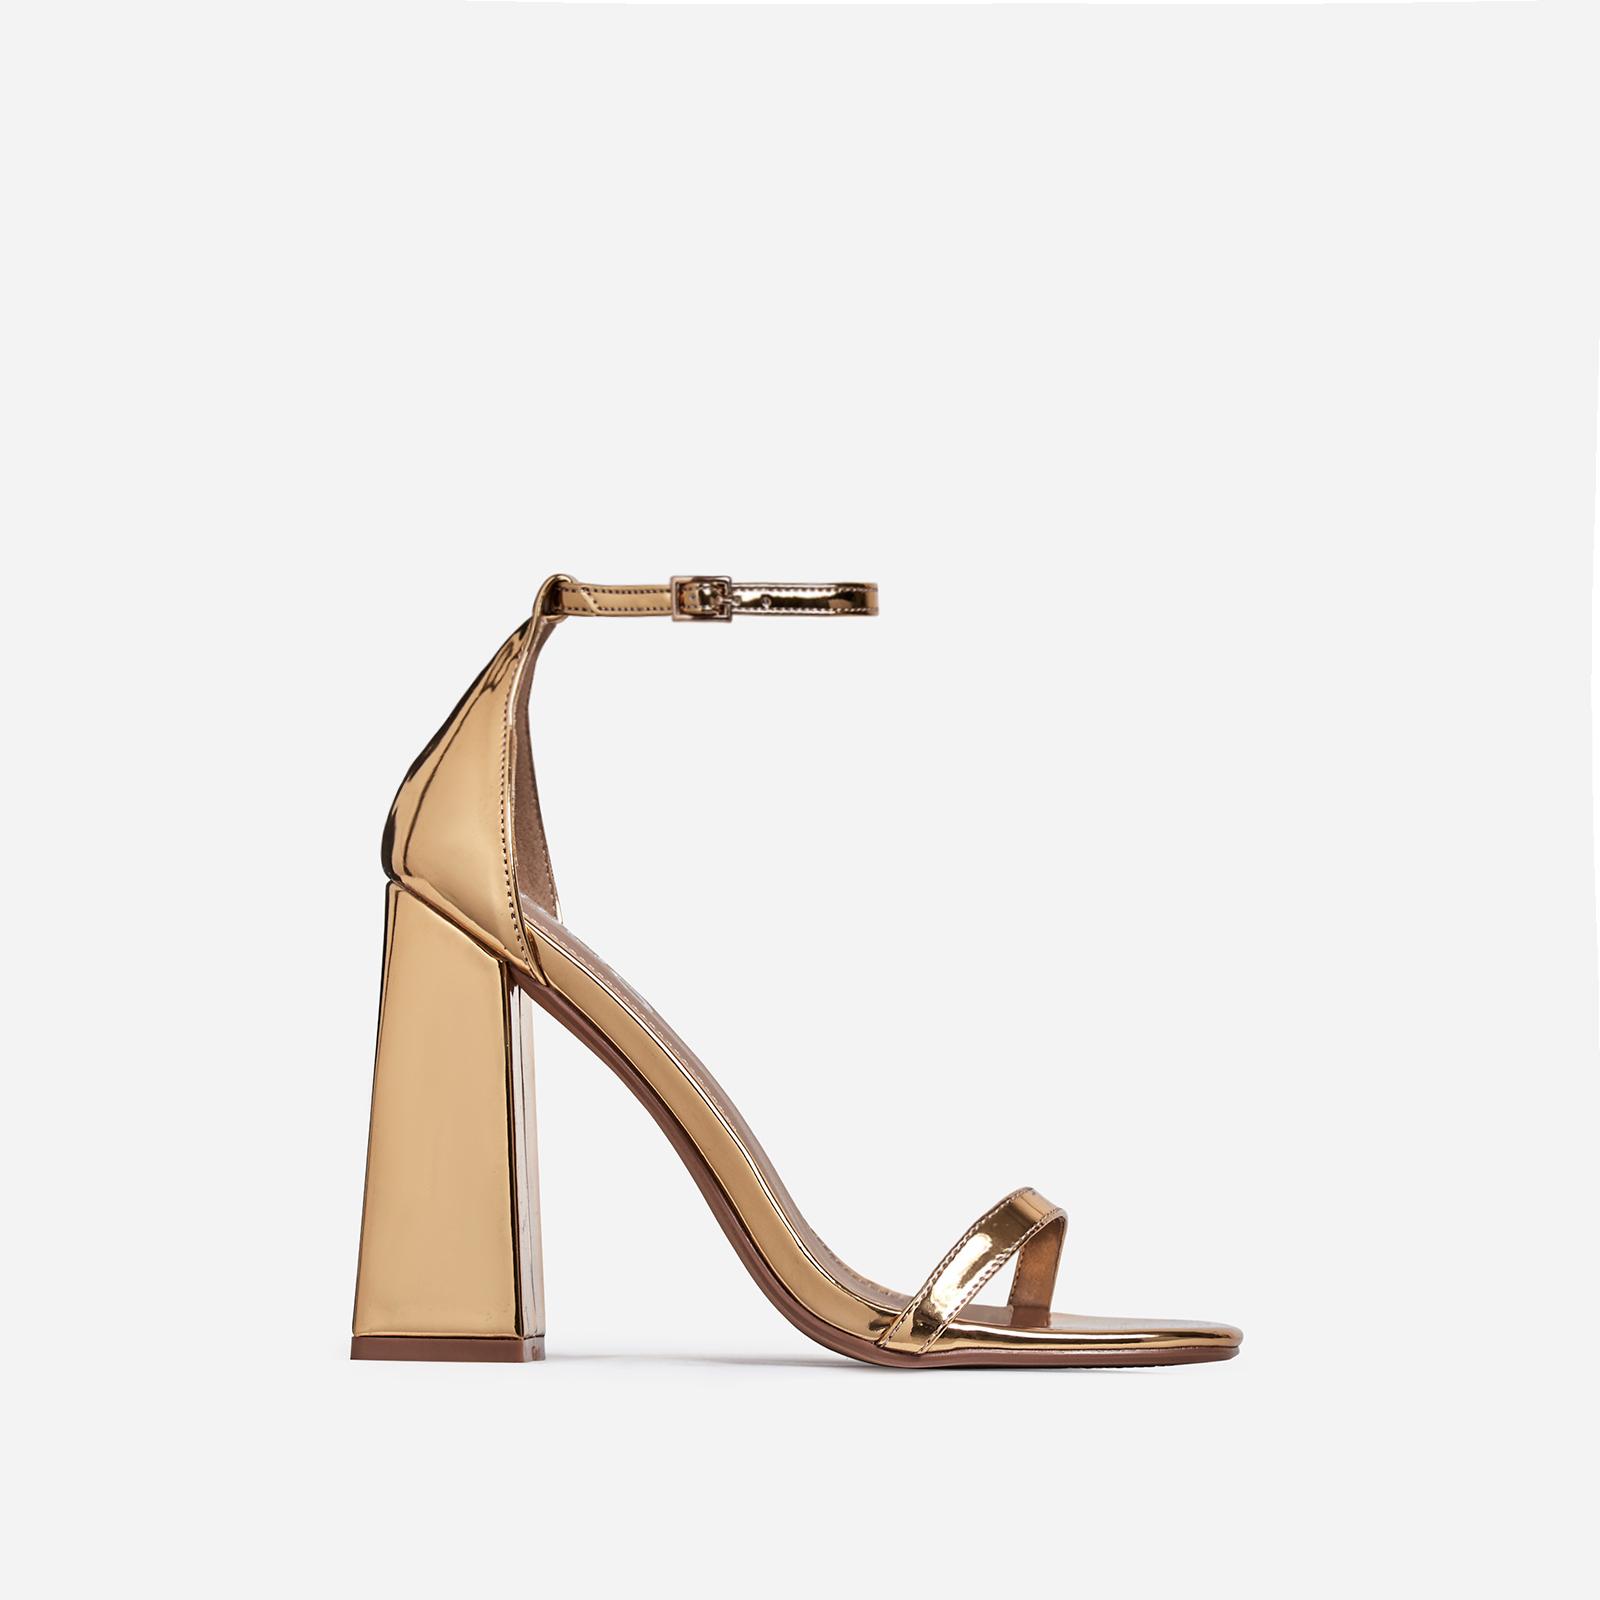 Atomic Square Block Heel In Gold Patent